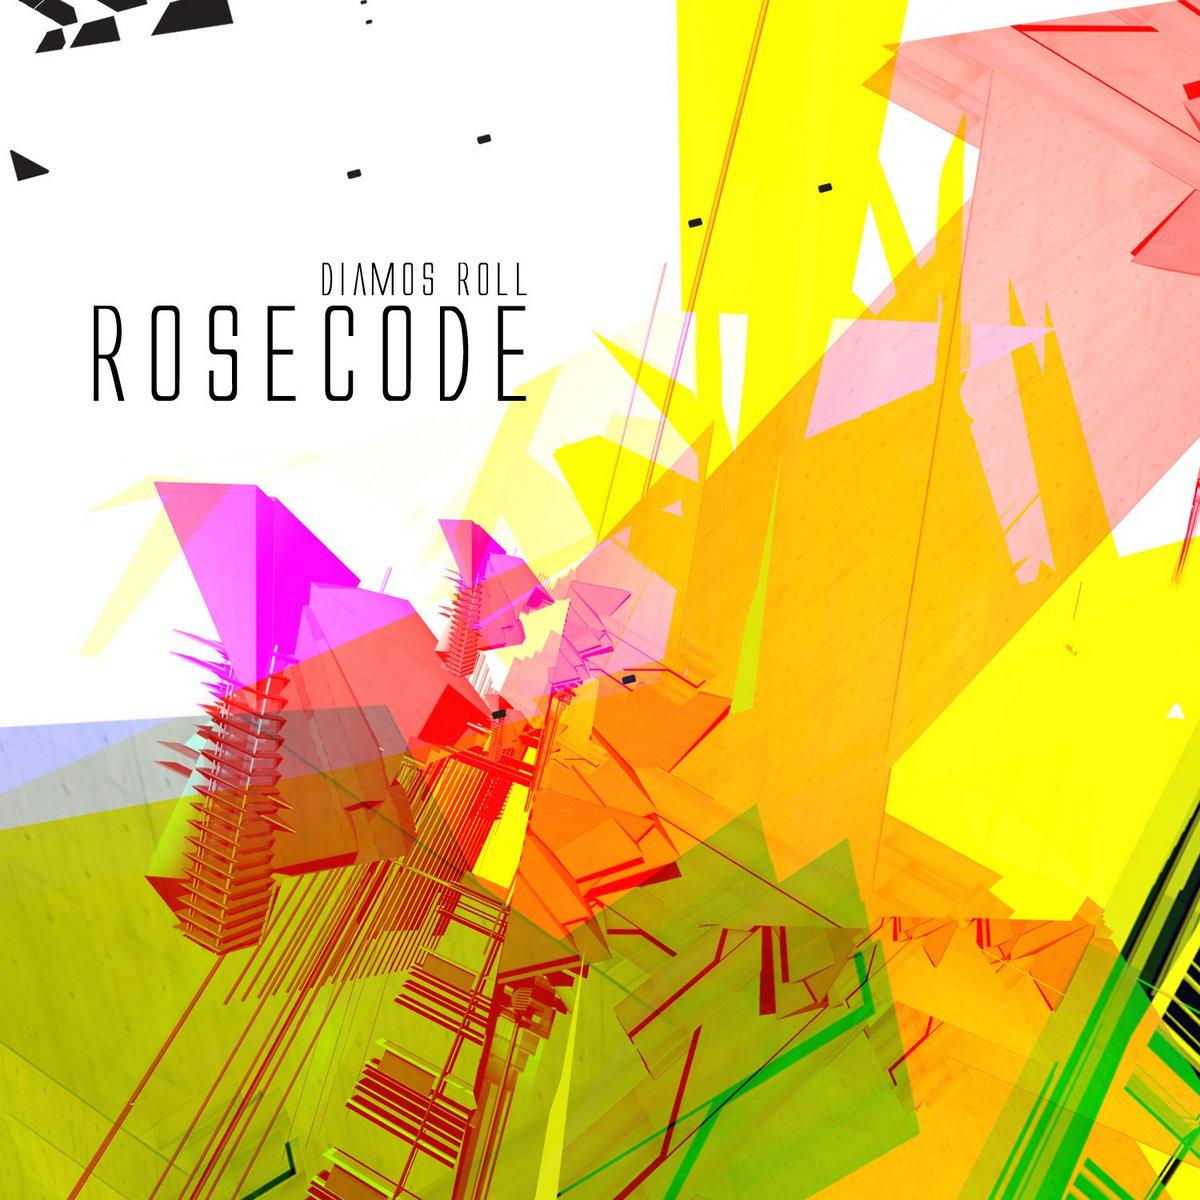 Rosecode | ULTRA VAGUE